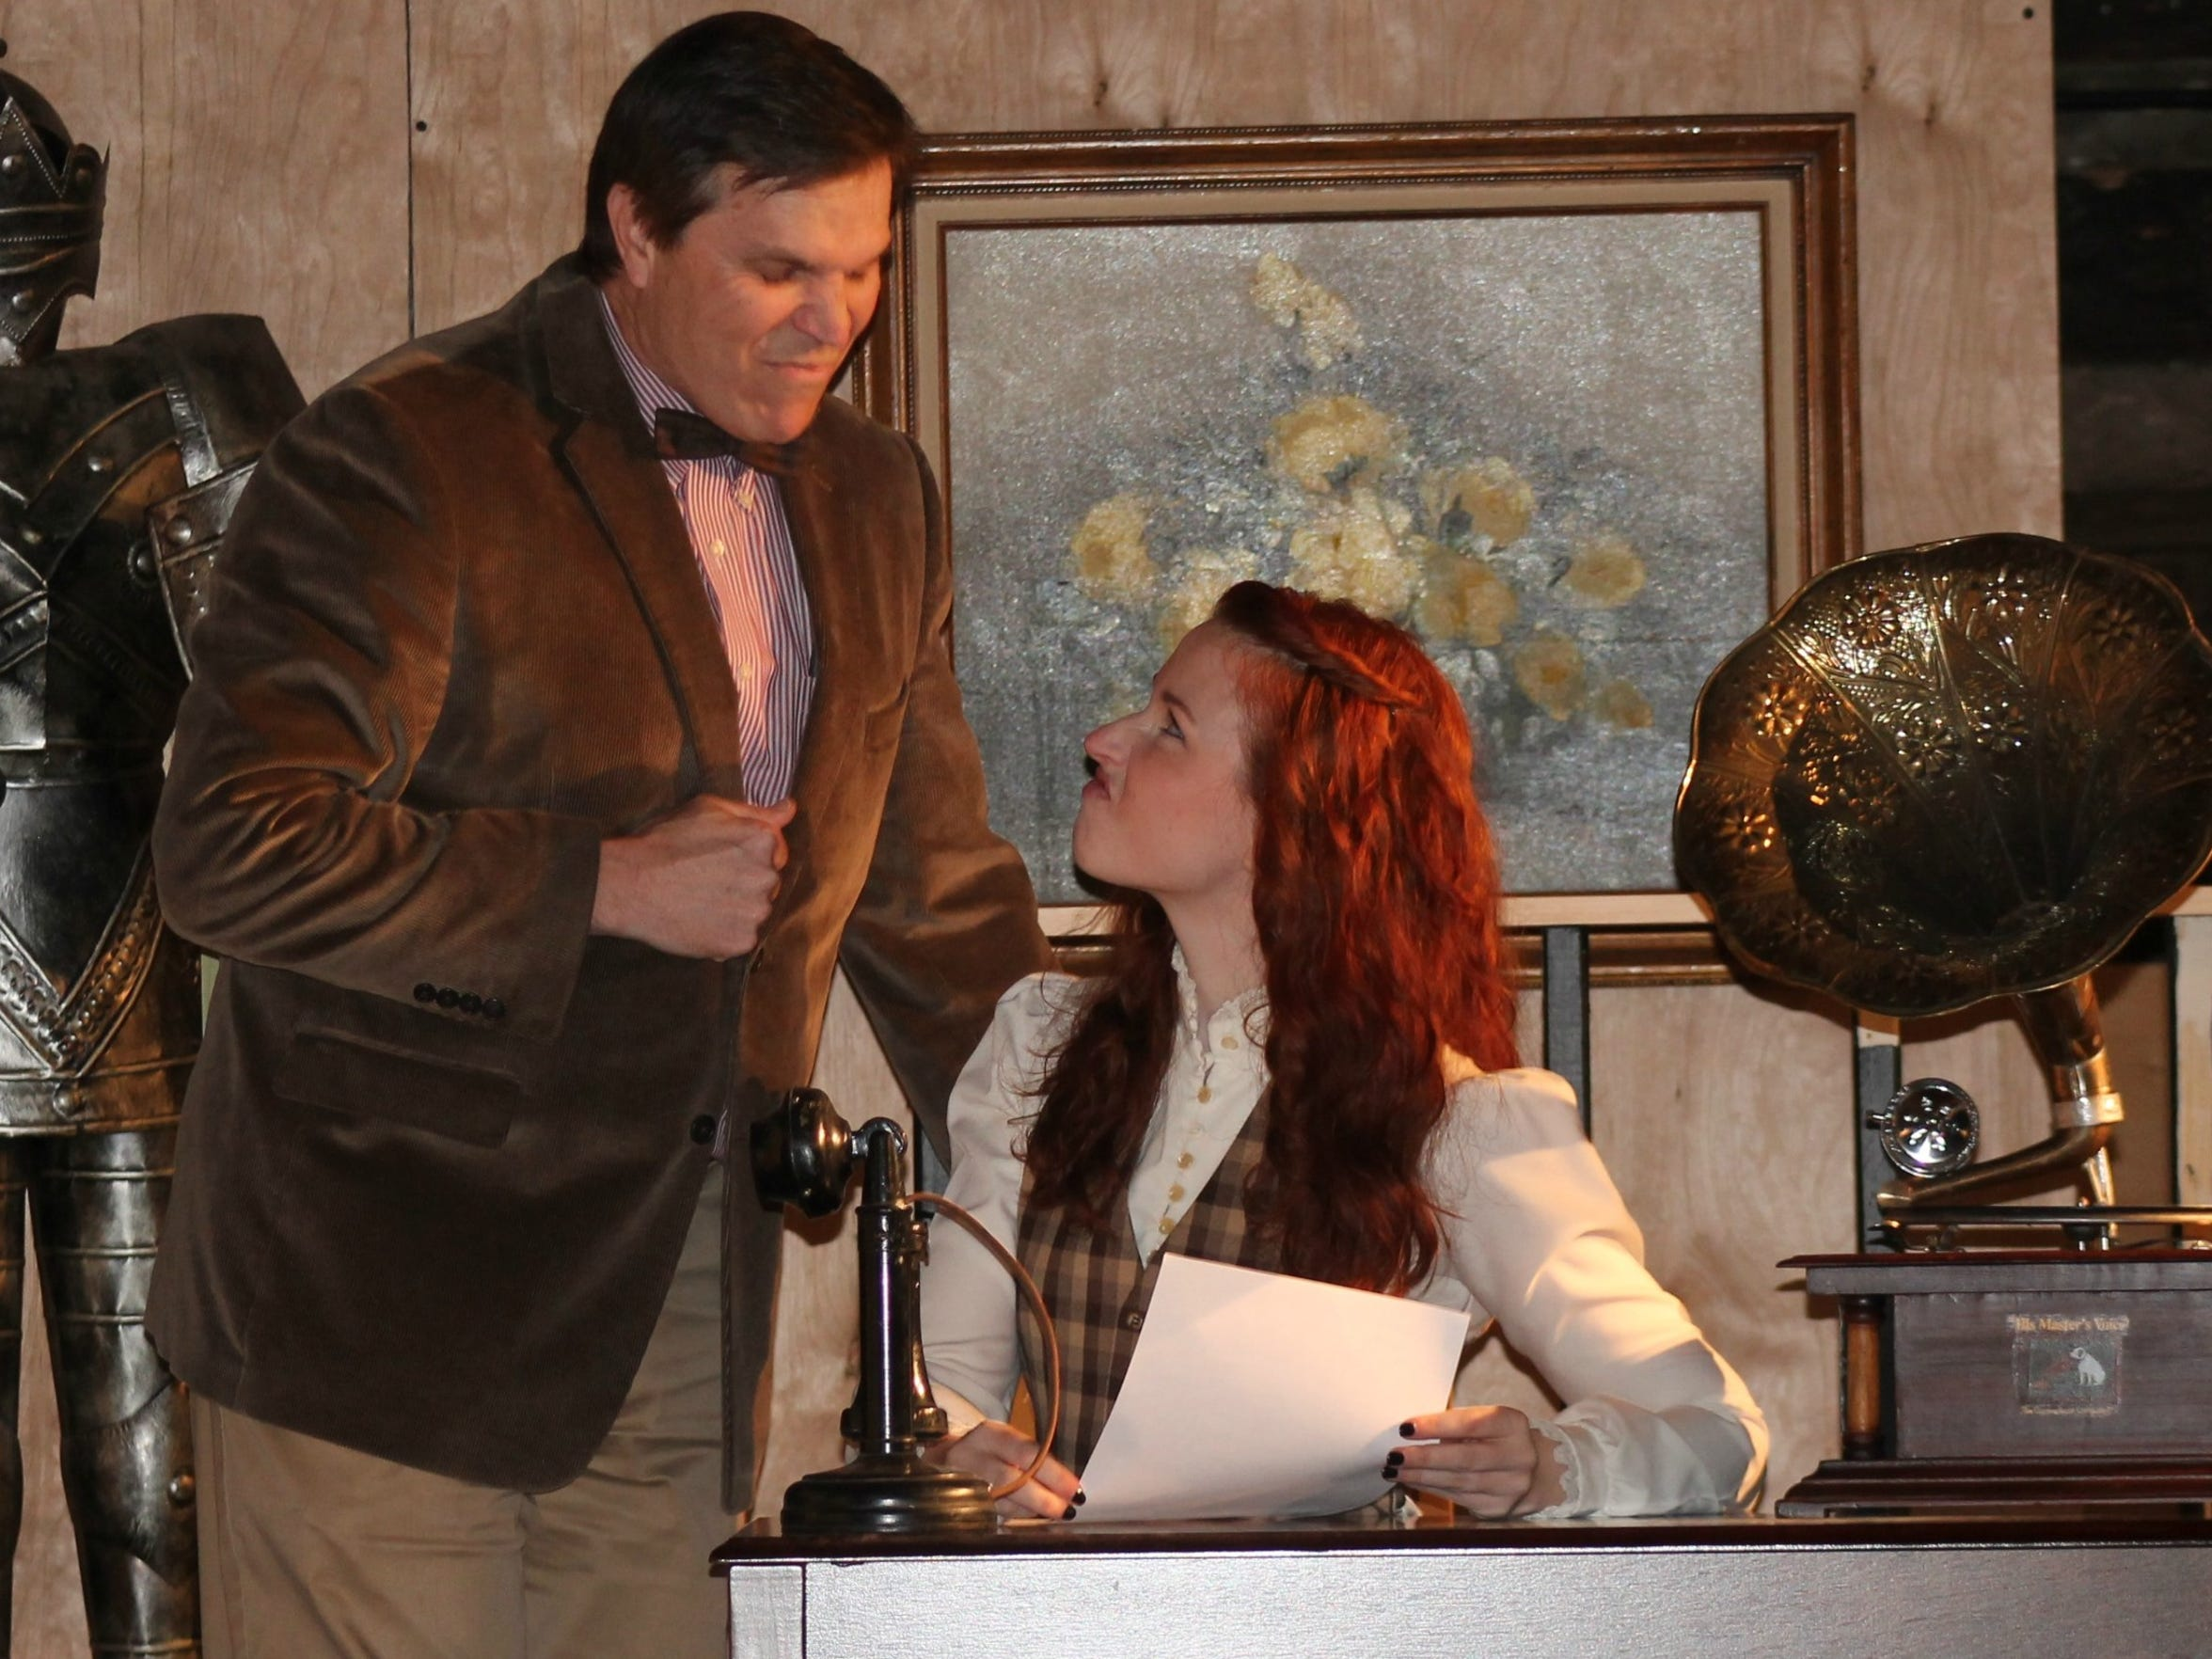 'My Fair Lady' will take stage Friday through Sunday at Murfreesboro Little Theatre's Playhouse, 702 Ewing Blvd. in Murfreesboro.